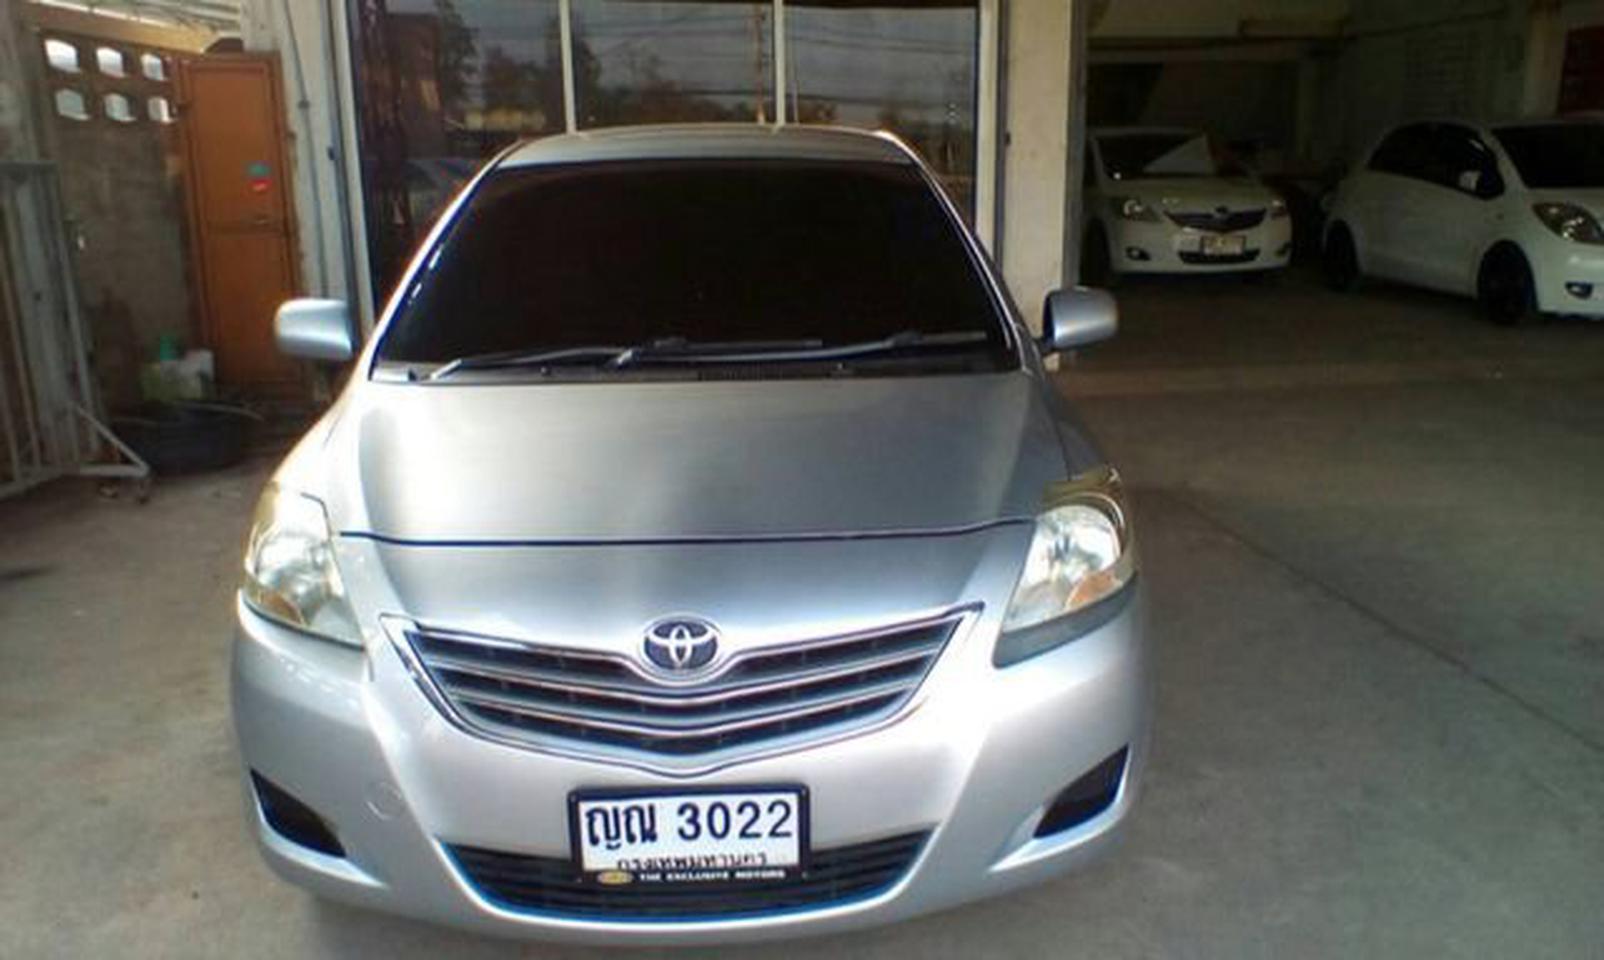 Toyota vios 1.5 Ev ปี2011 รถสวย นางฟ้า มีของแถม รูปที่ 4